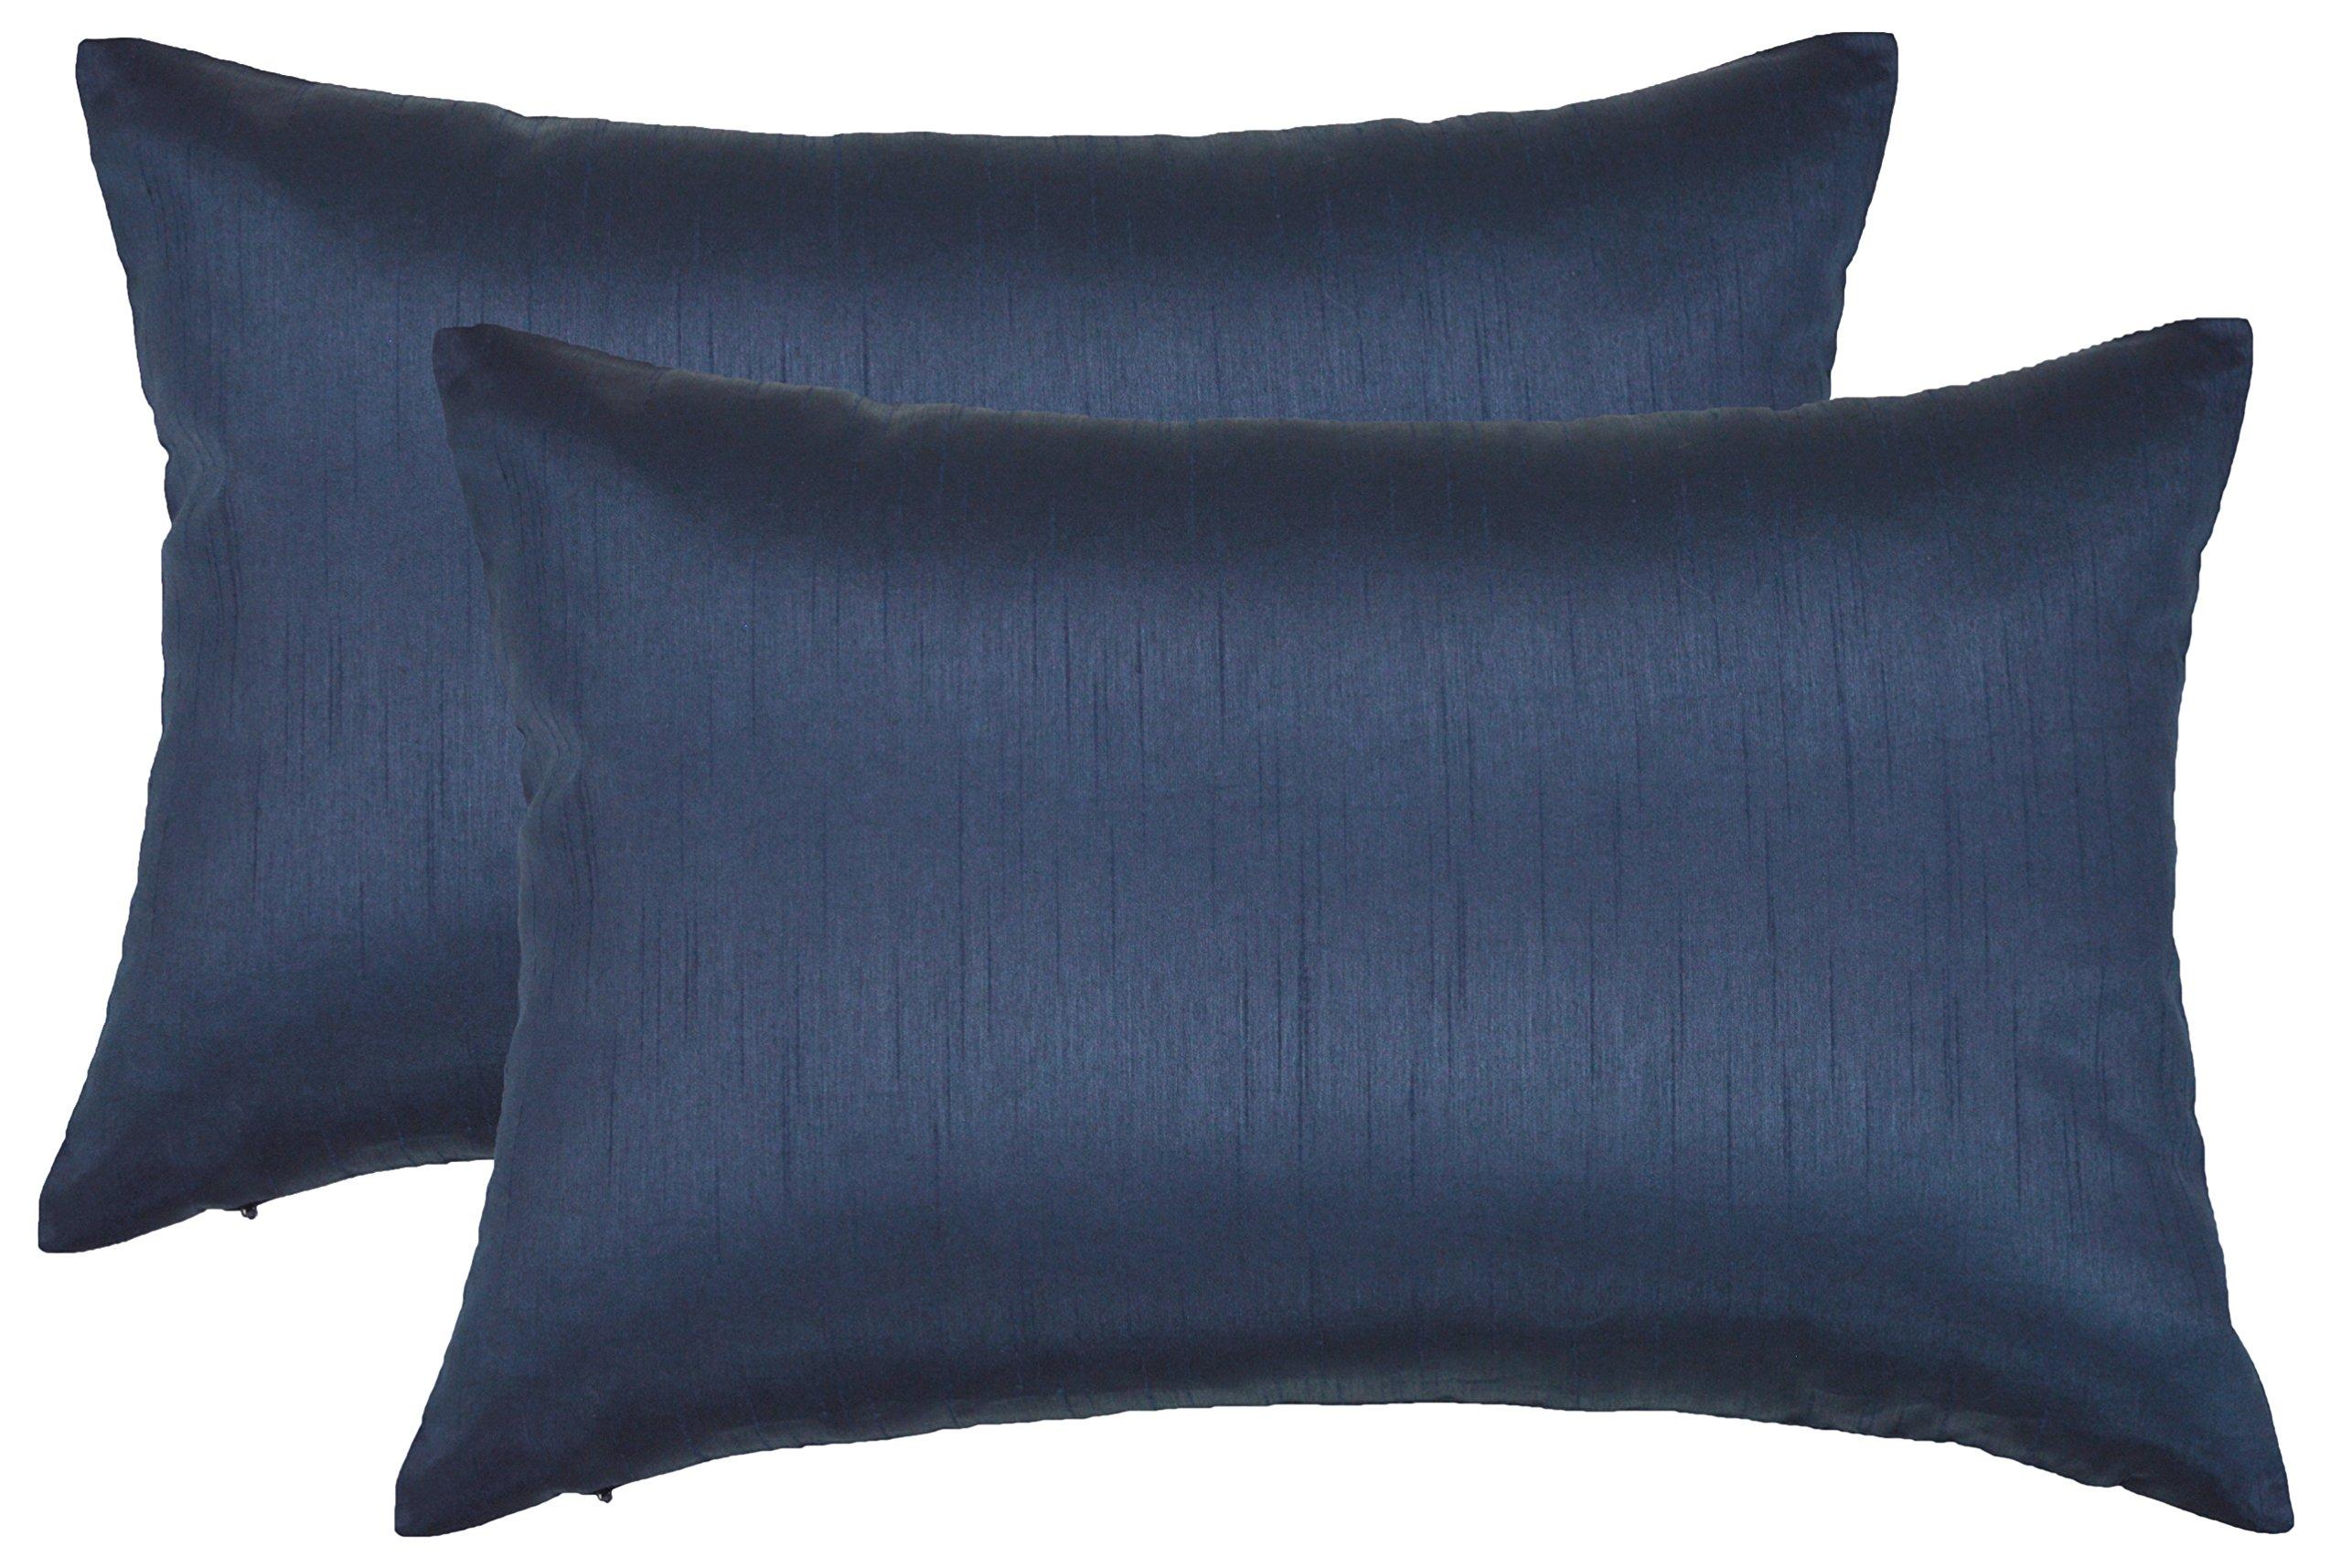 Aiking Home 12x18 Inches Faux Silk Rectangular Throw Pillow Cover, Zipper Closure, Navy (Set of 2)